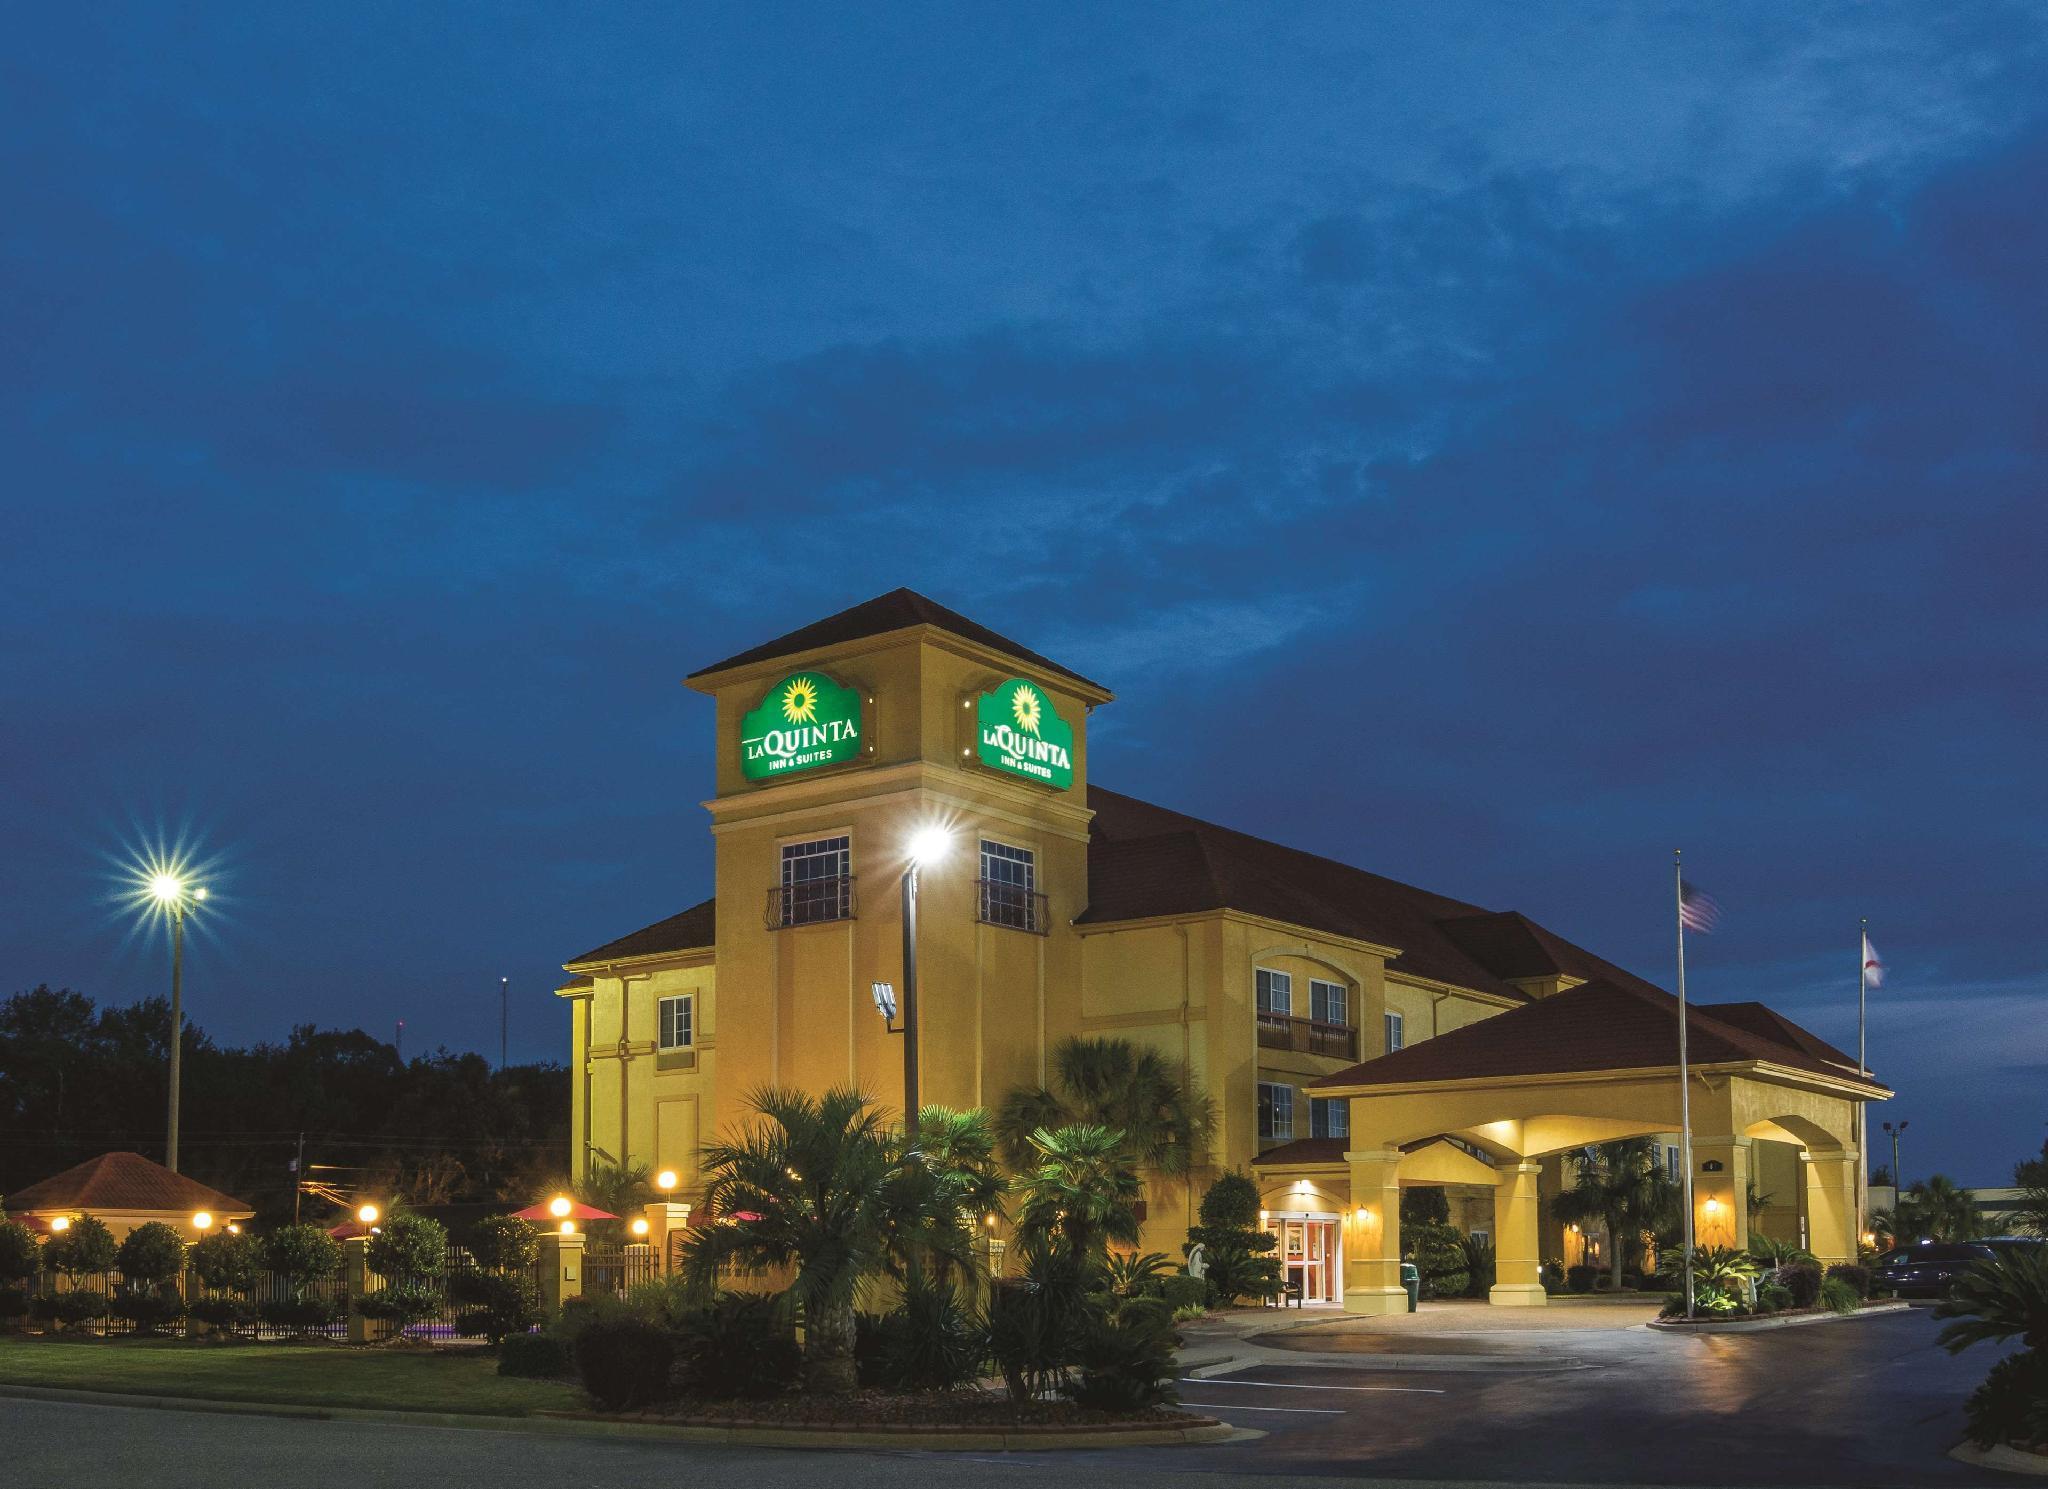 La Quinta Inn And Suites By Wyndham Prattville